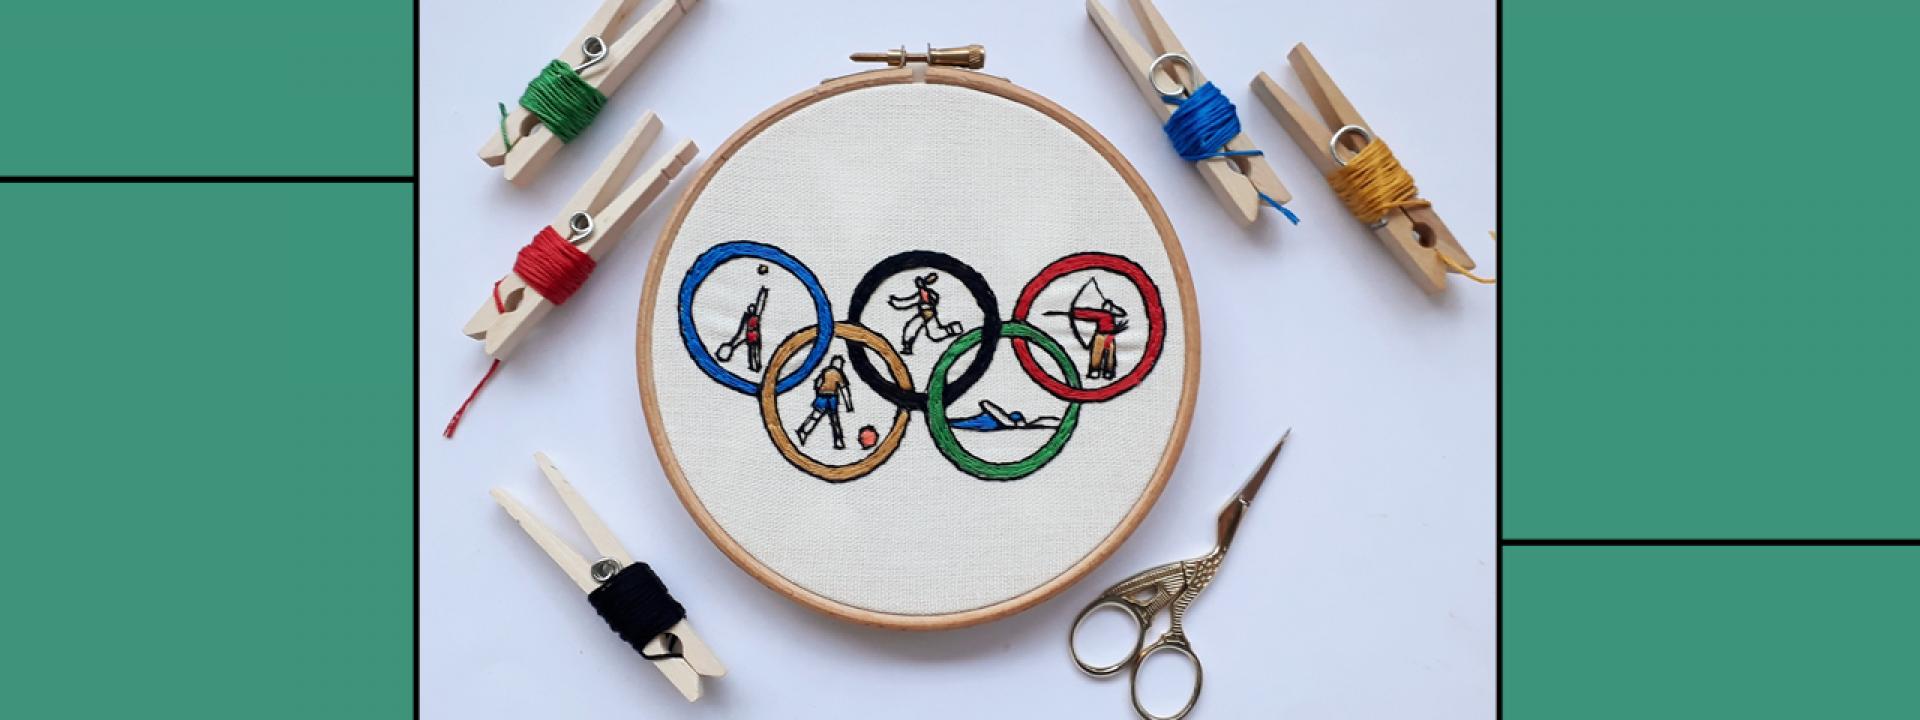 Creative Embroidery: Eminent personalities - June - Εικόνα